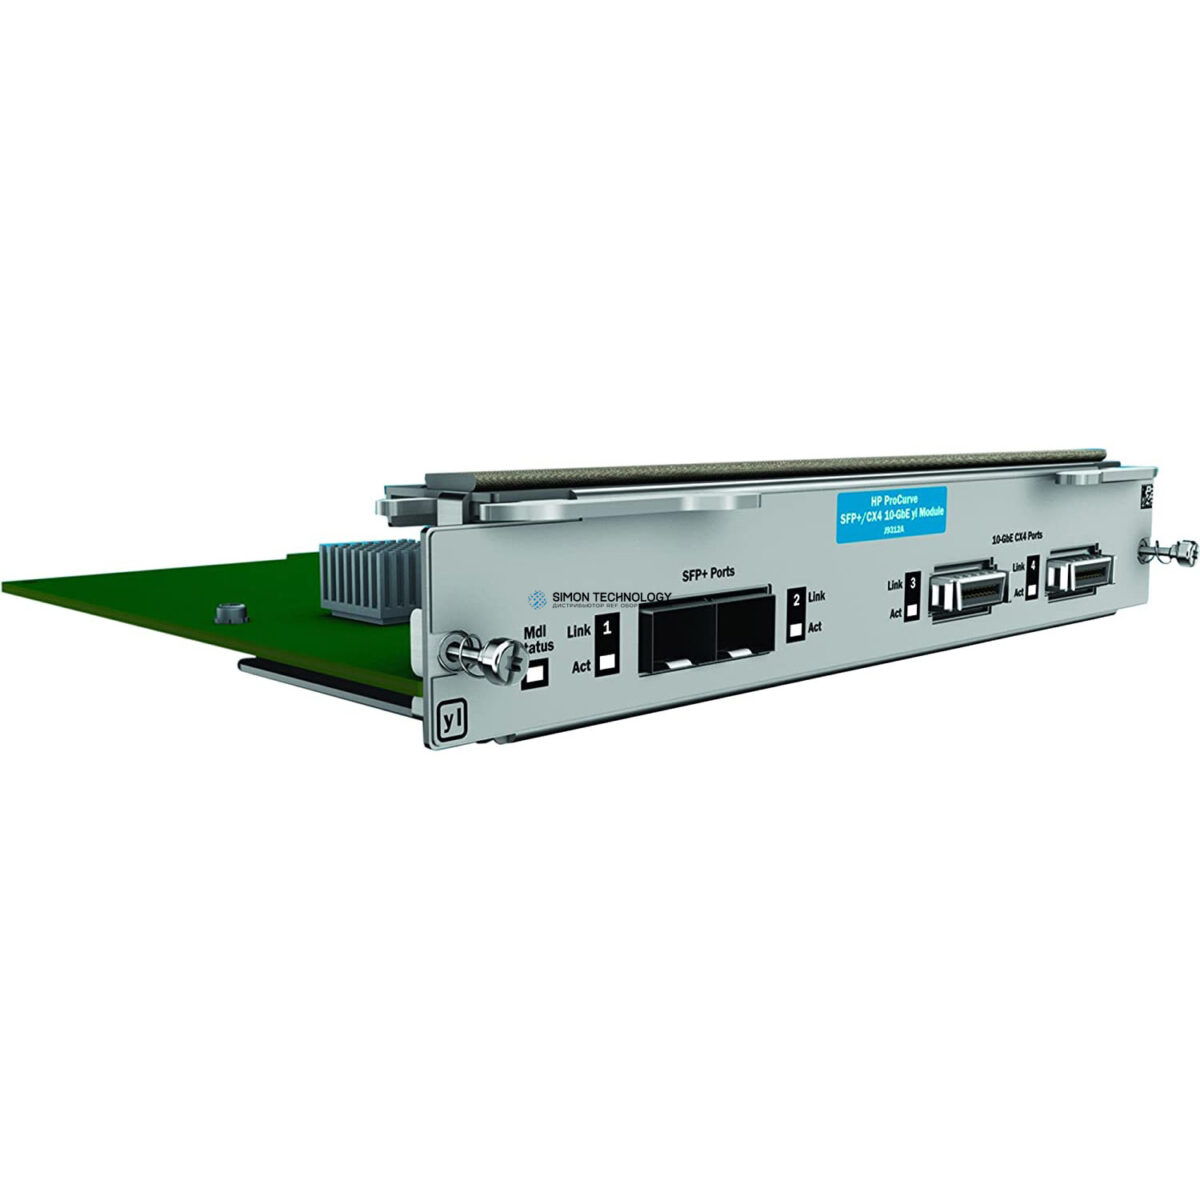 Модуль HP HP PROCURVE 10GBE 2P SFP+/2P CX4 YL MODULE (J9312A)